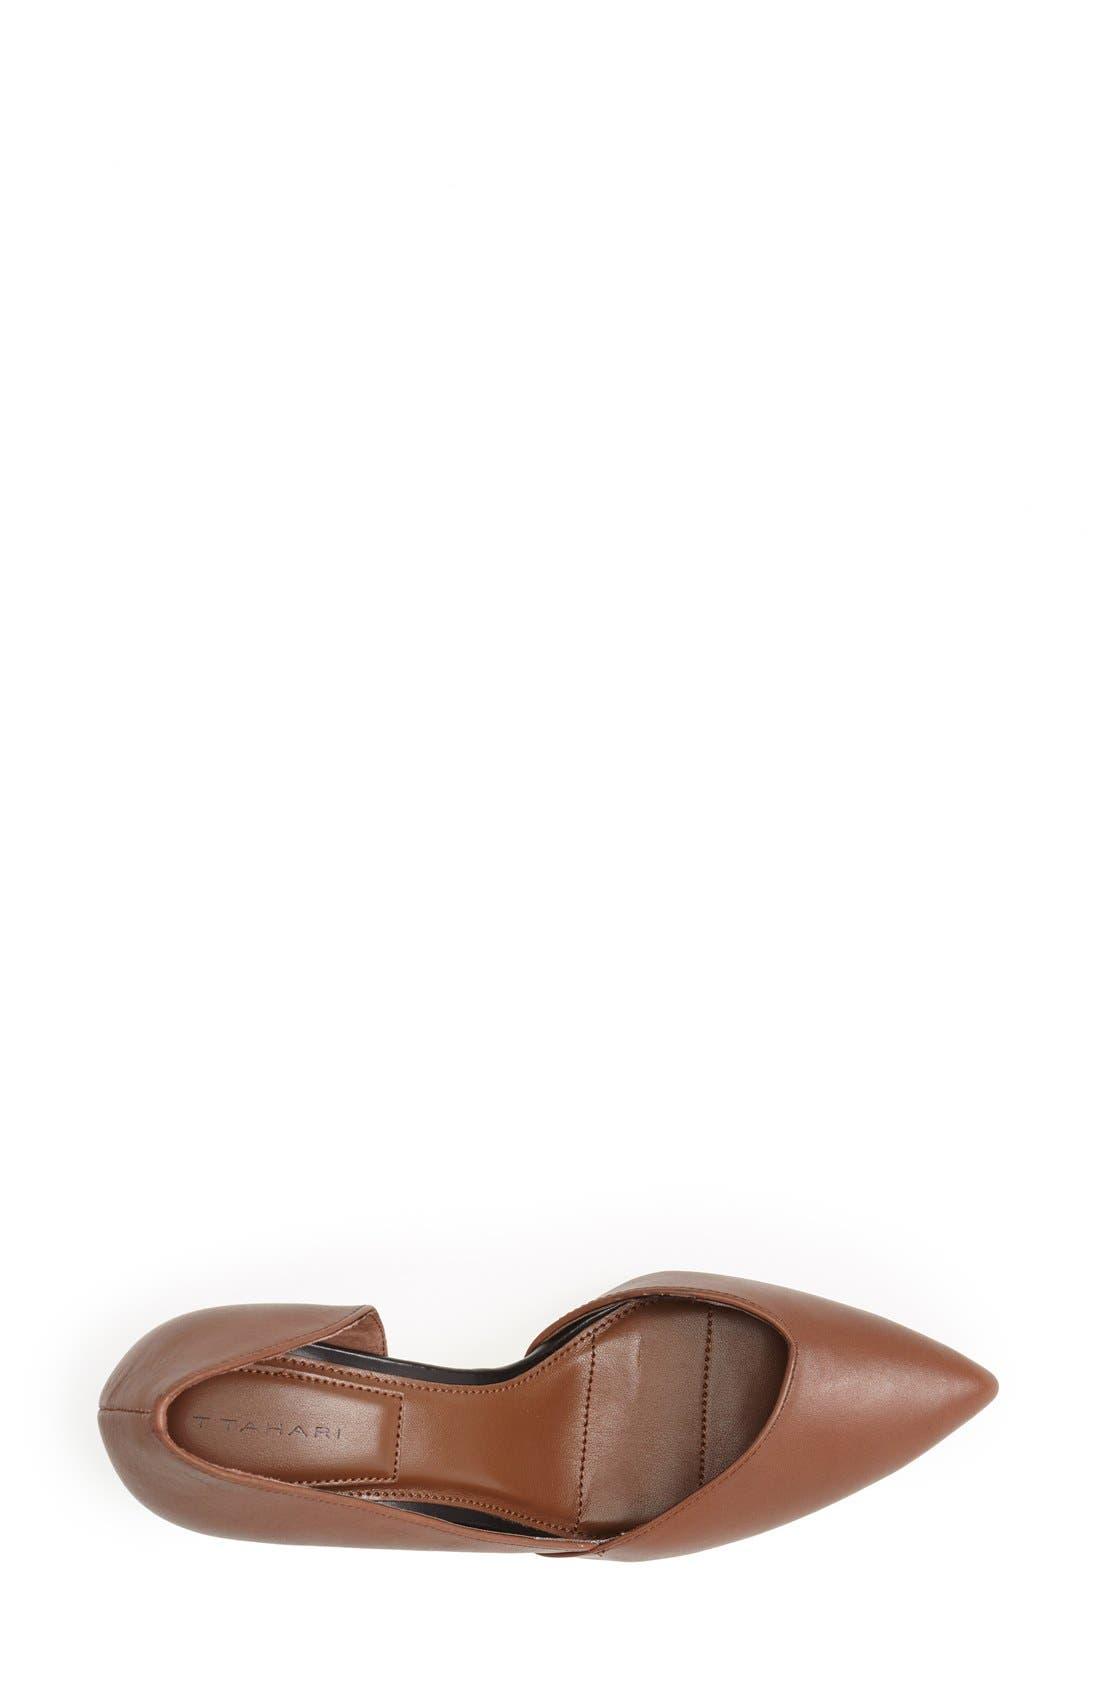 Alternate Image 4  - T Tahari 'Lars' Pointy Toe Leather Pump (Women)